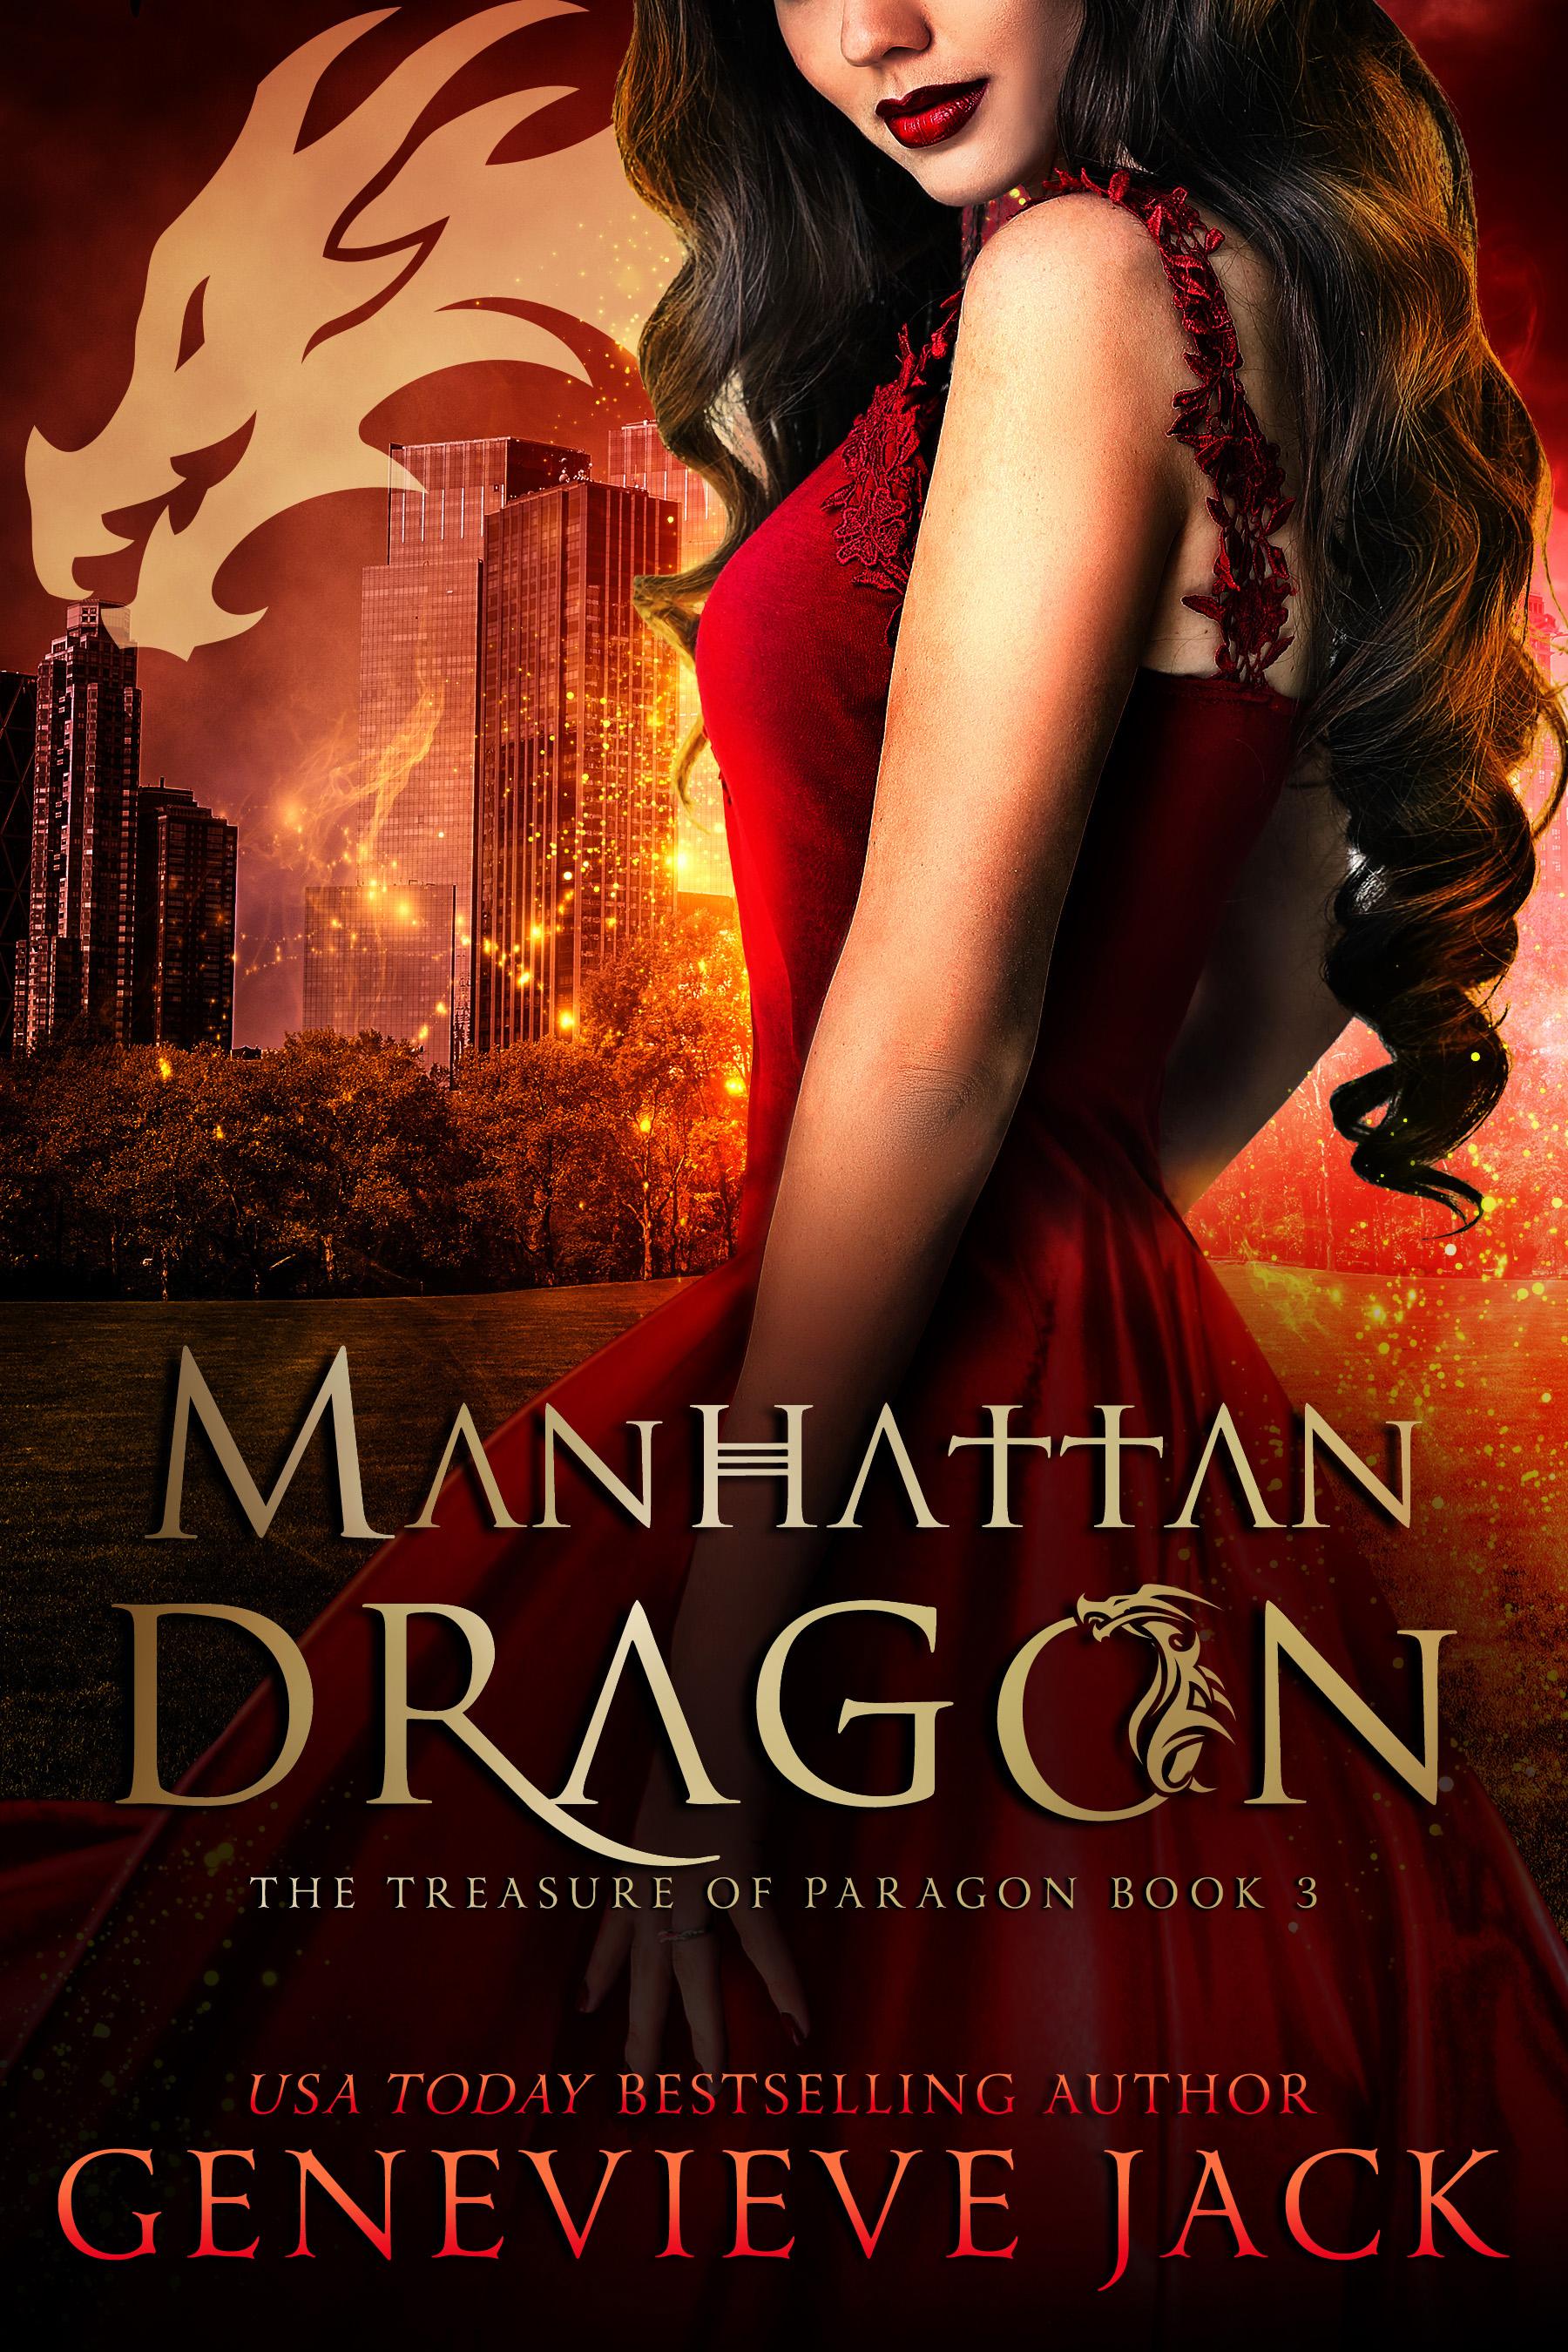 Manhattan Dragon